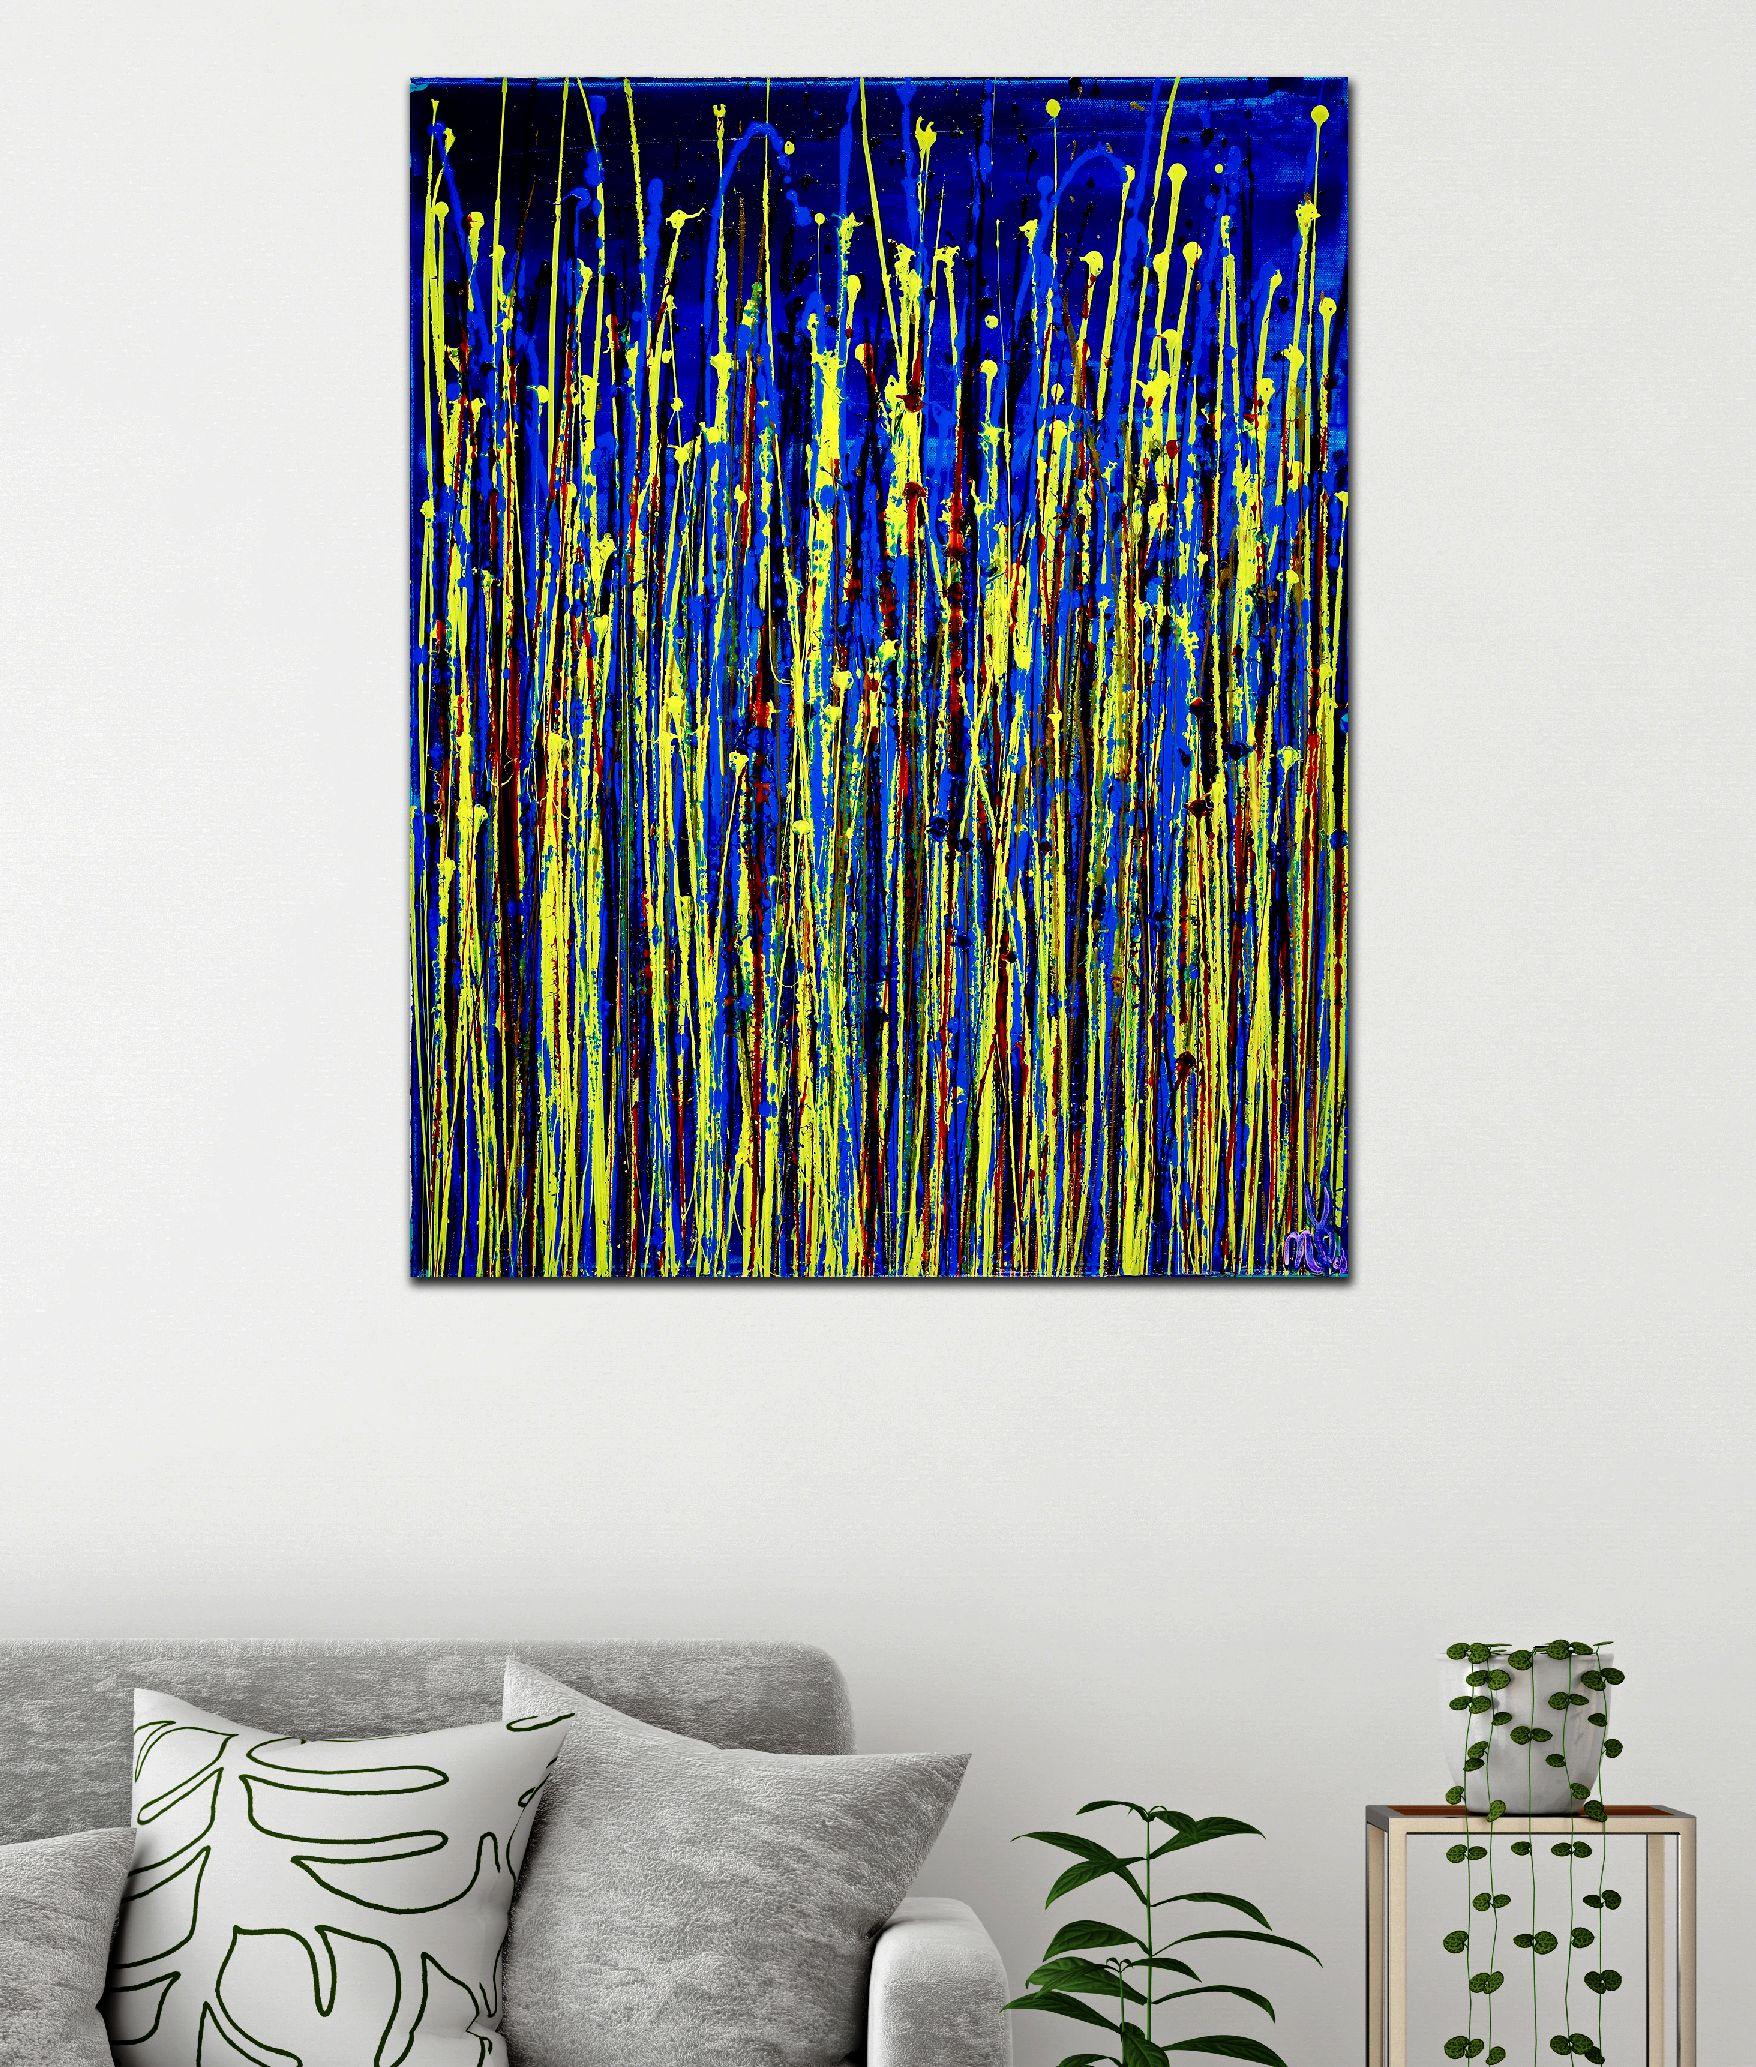 Room View - Shimmering Garden 1 (Flow State) by Nestor Toro 2020